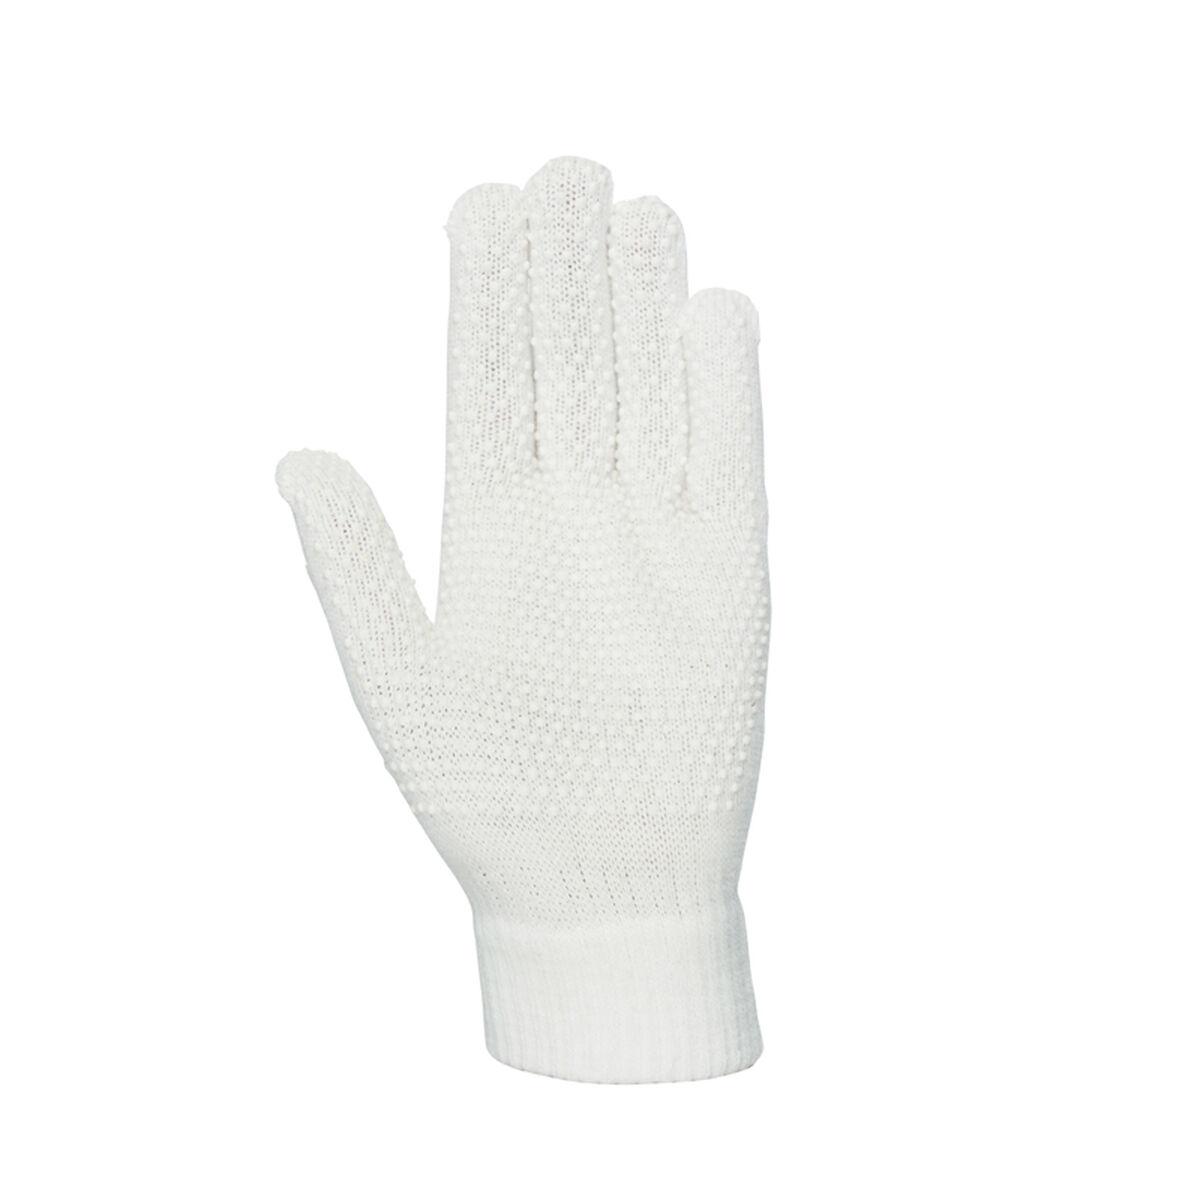 Black gloves white magic - Horze Magic Gloves Horze Magic Gloves